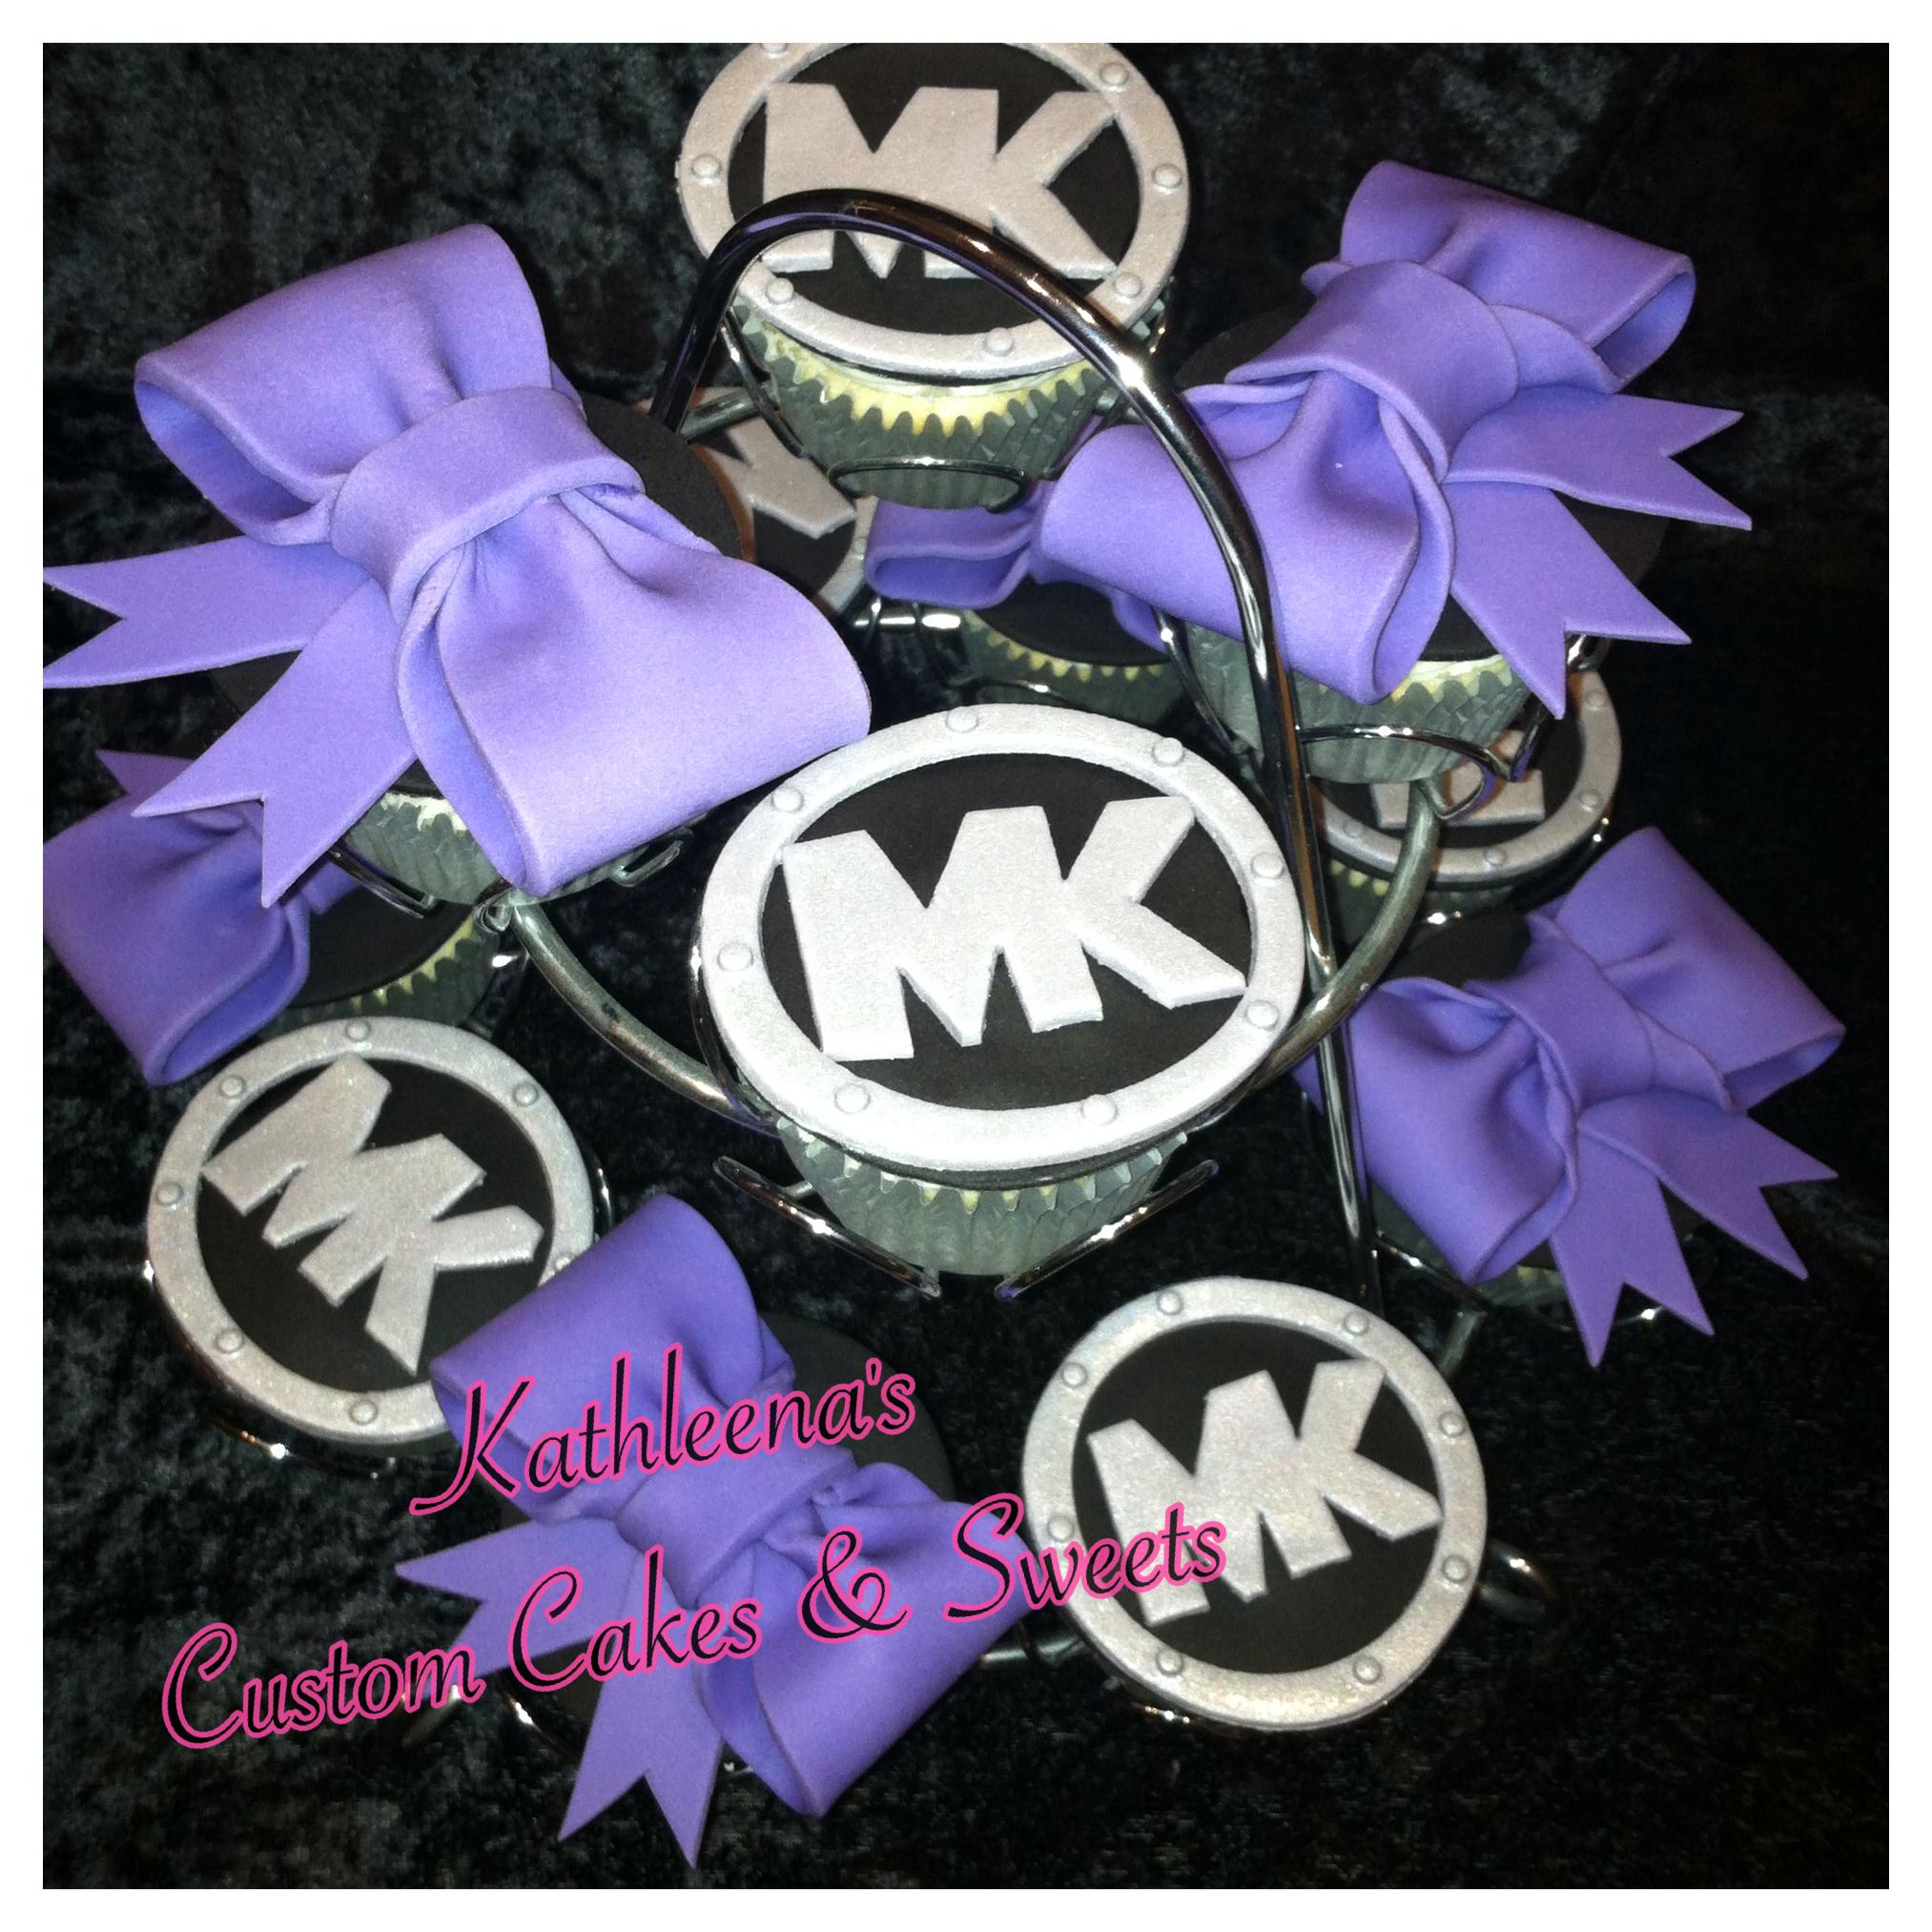 - Michael Kors Cupcakes KW_Cupcake@yahoo.com